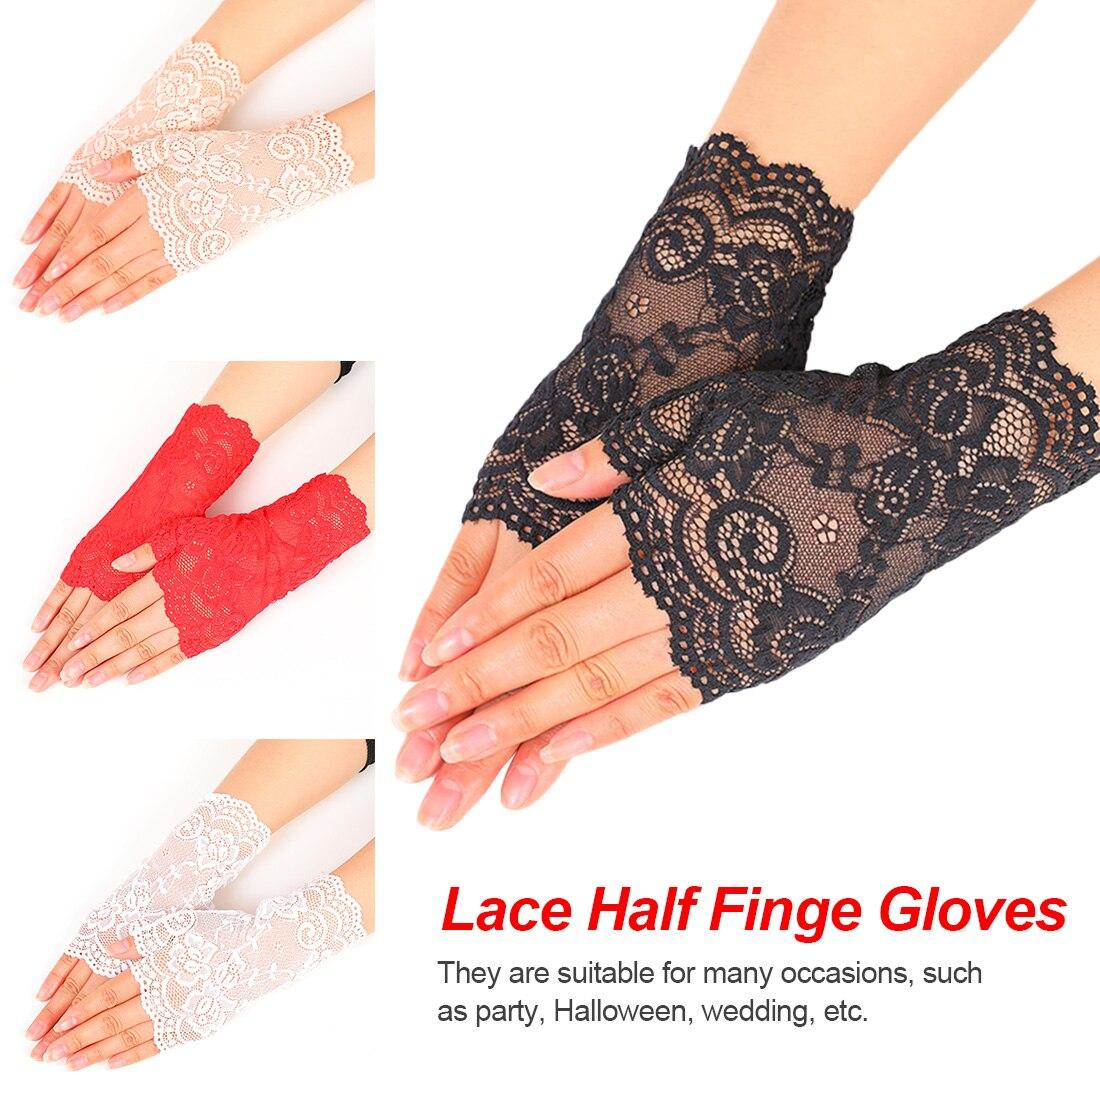 Sheer Floral Lace Fingerless Gloves Women Black Rose Gloves Scalloped Trim Summer Outdoor Sun-Blocking Mittens 2019 New Arrival